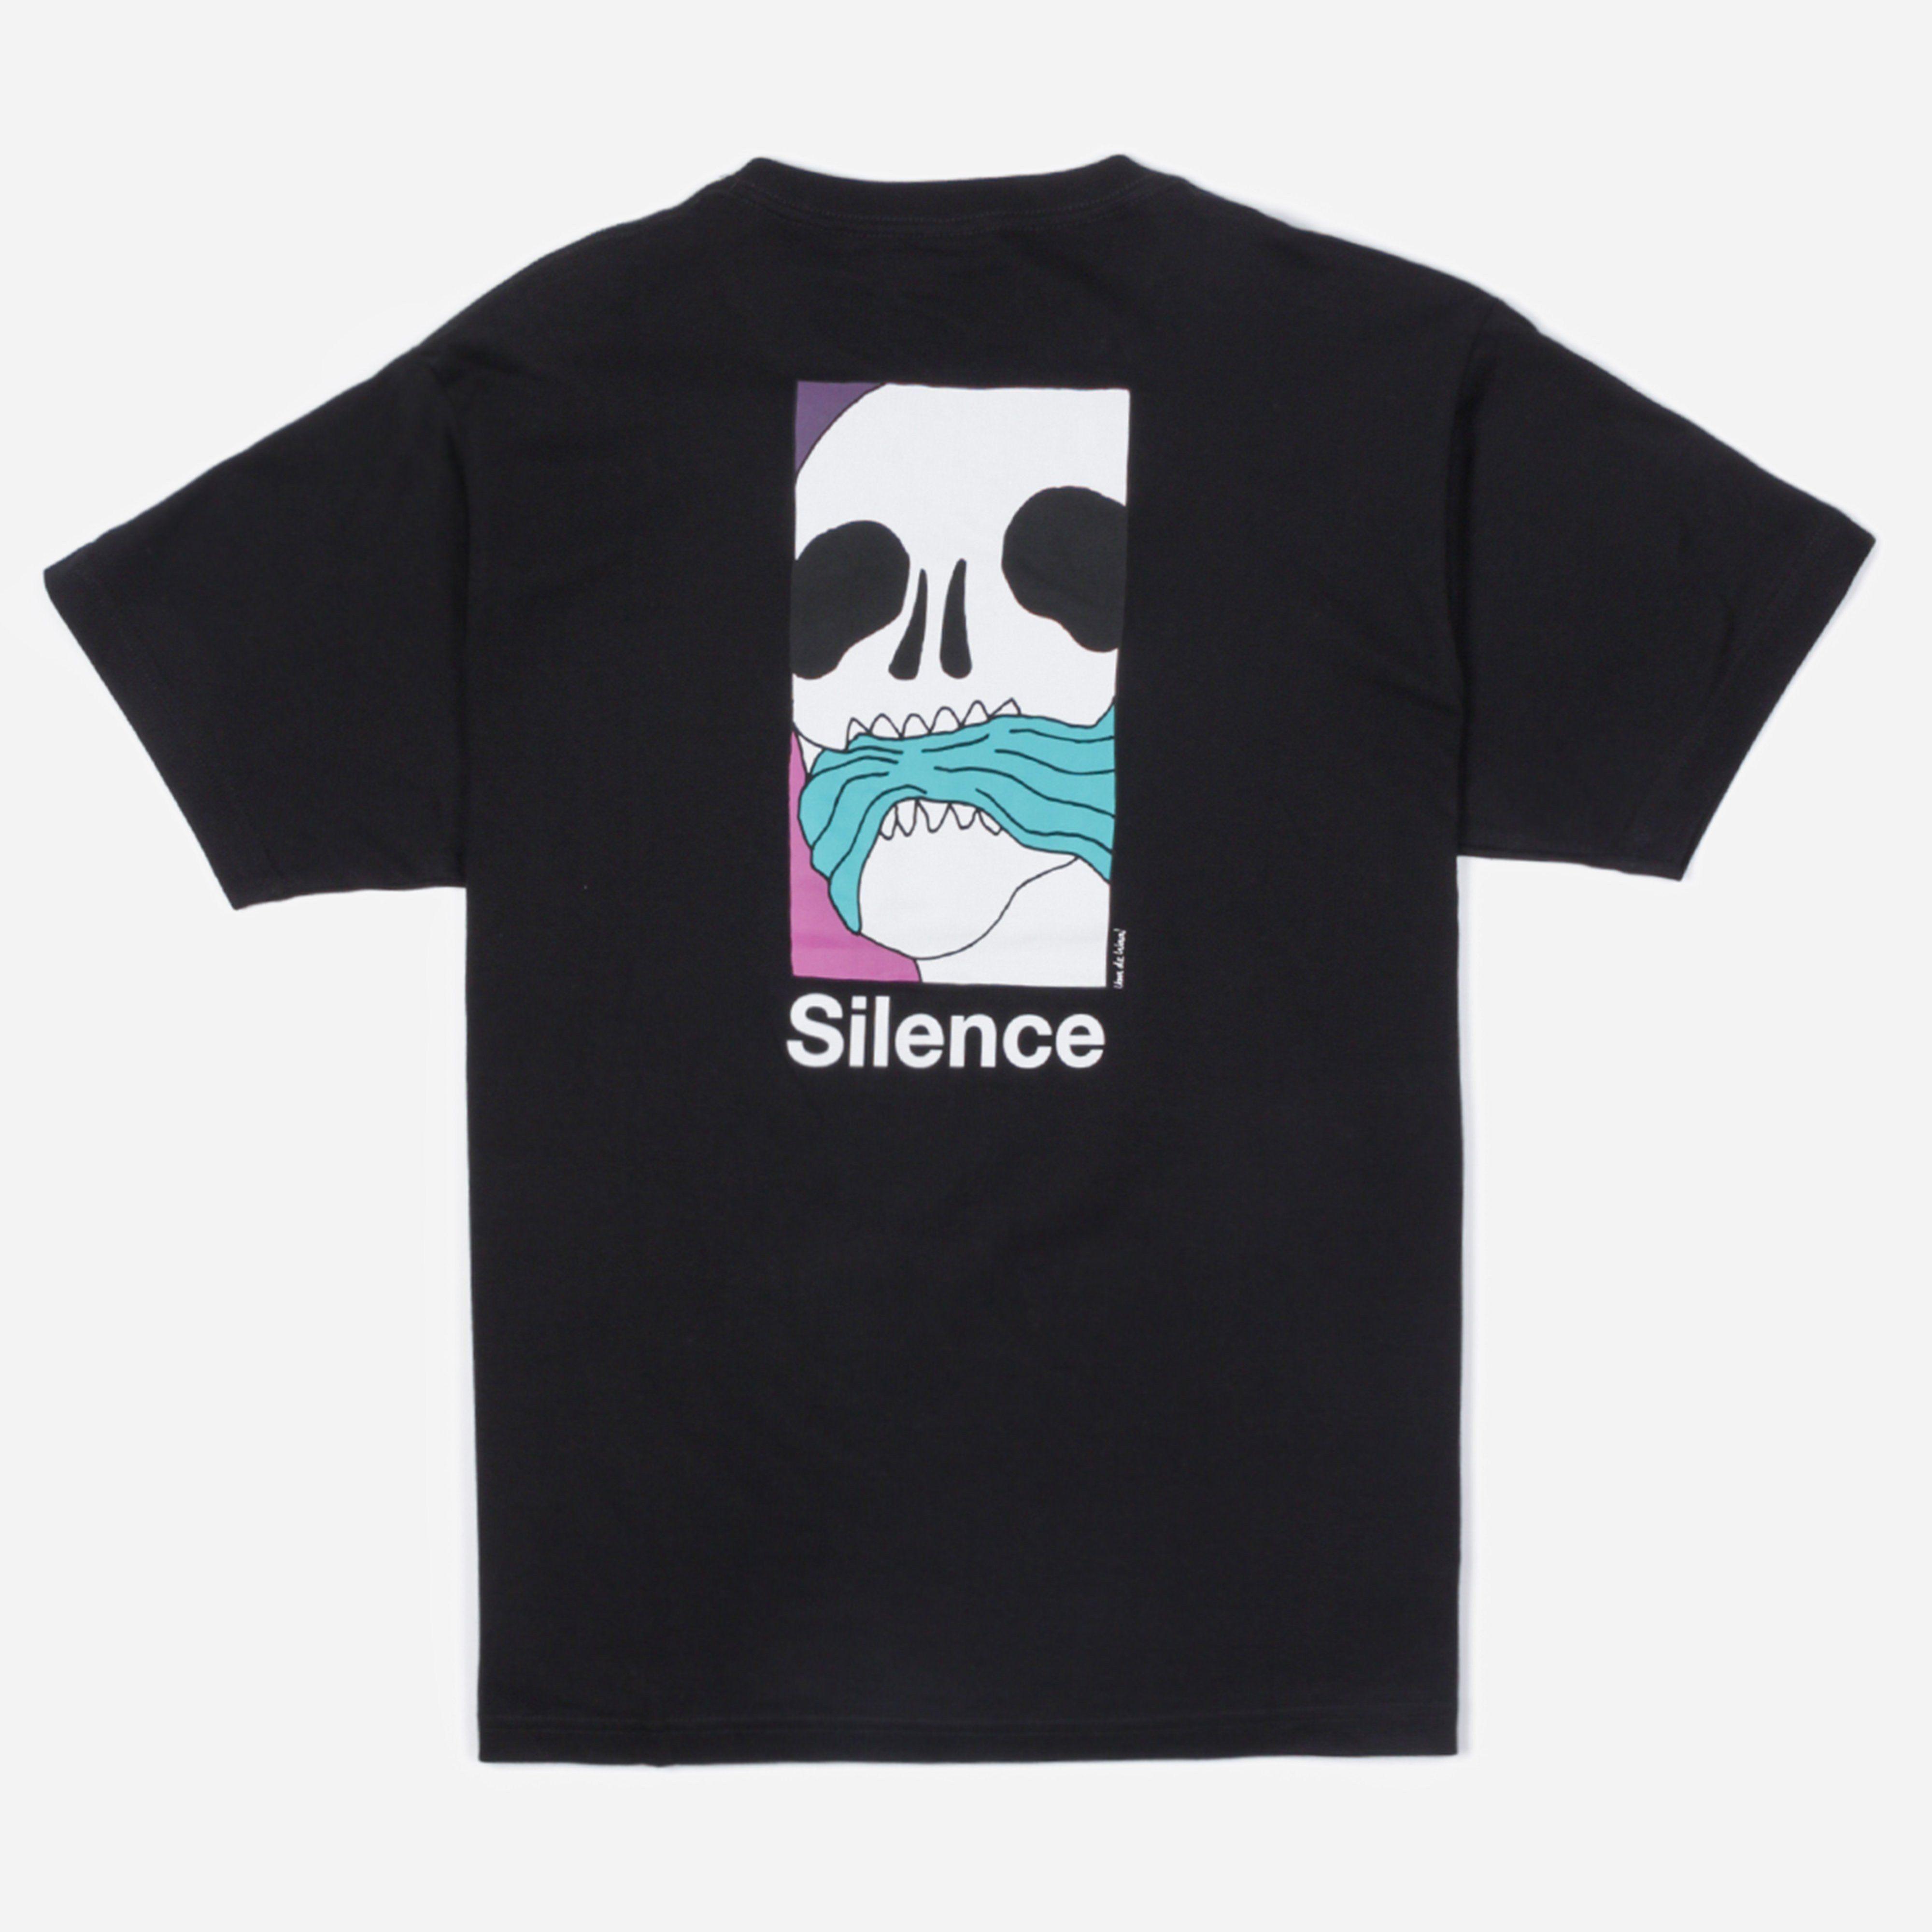 Patta Silence T-Shirt